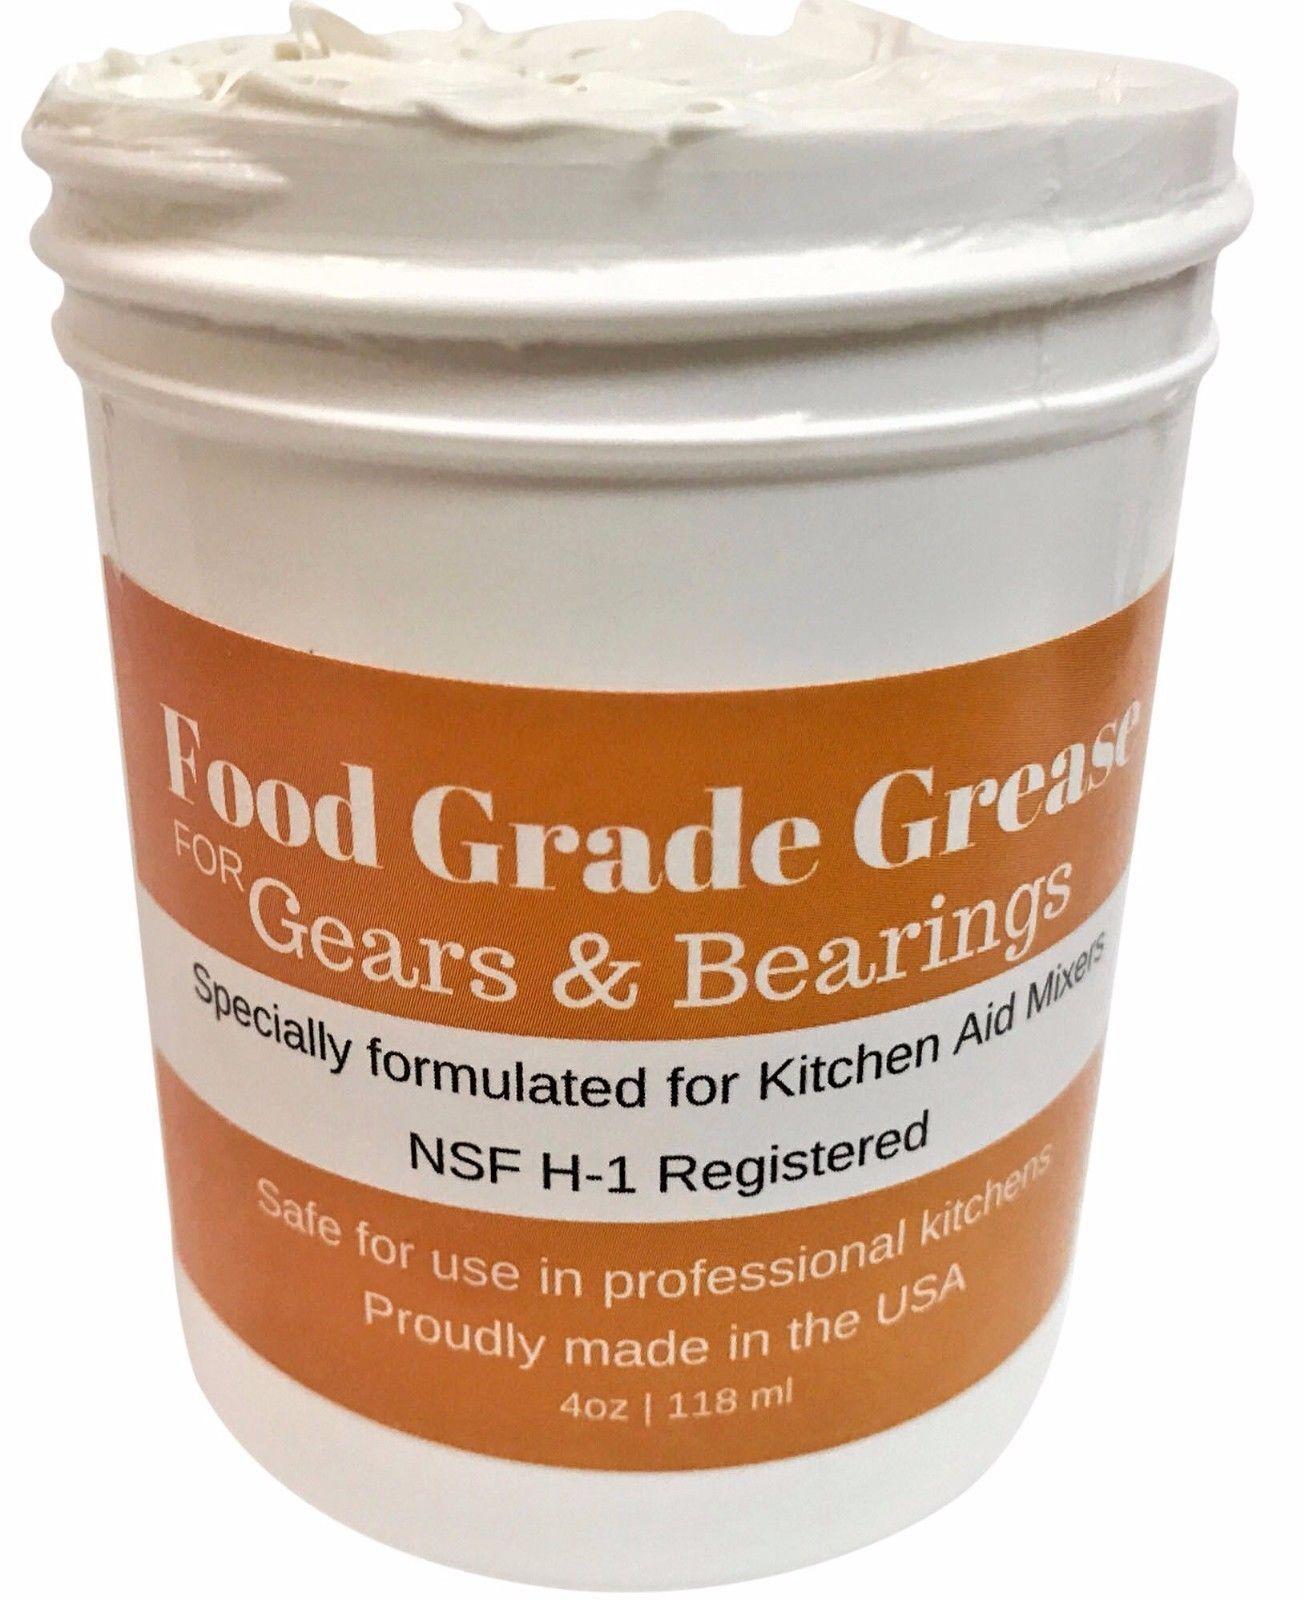 4oz Food Grade Grease for KitchenAid Stand Mixer